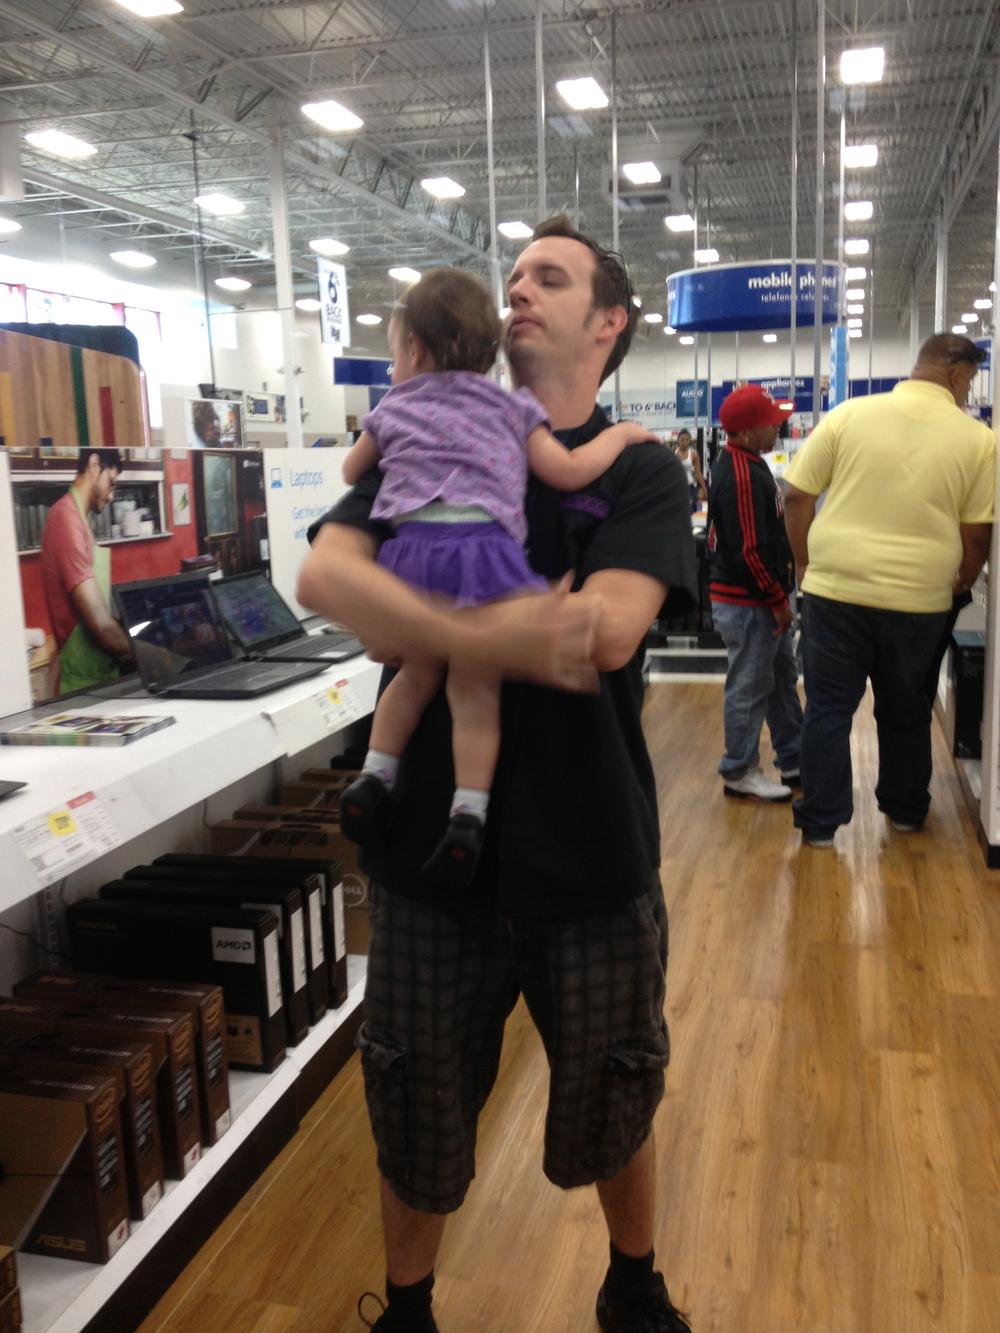 Spontaneous Daddy Hugs